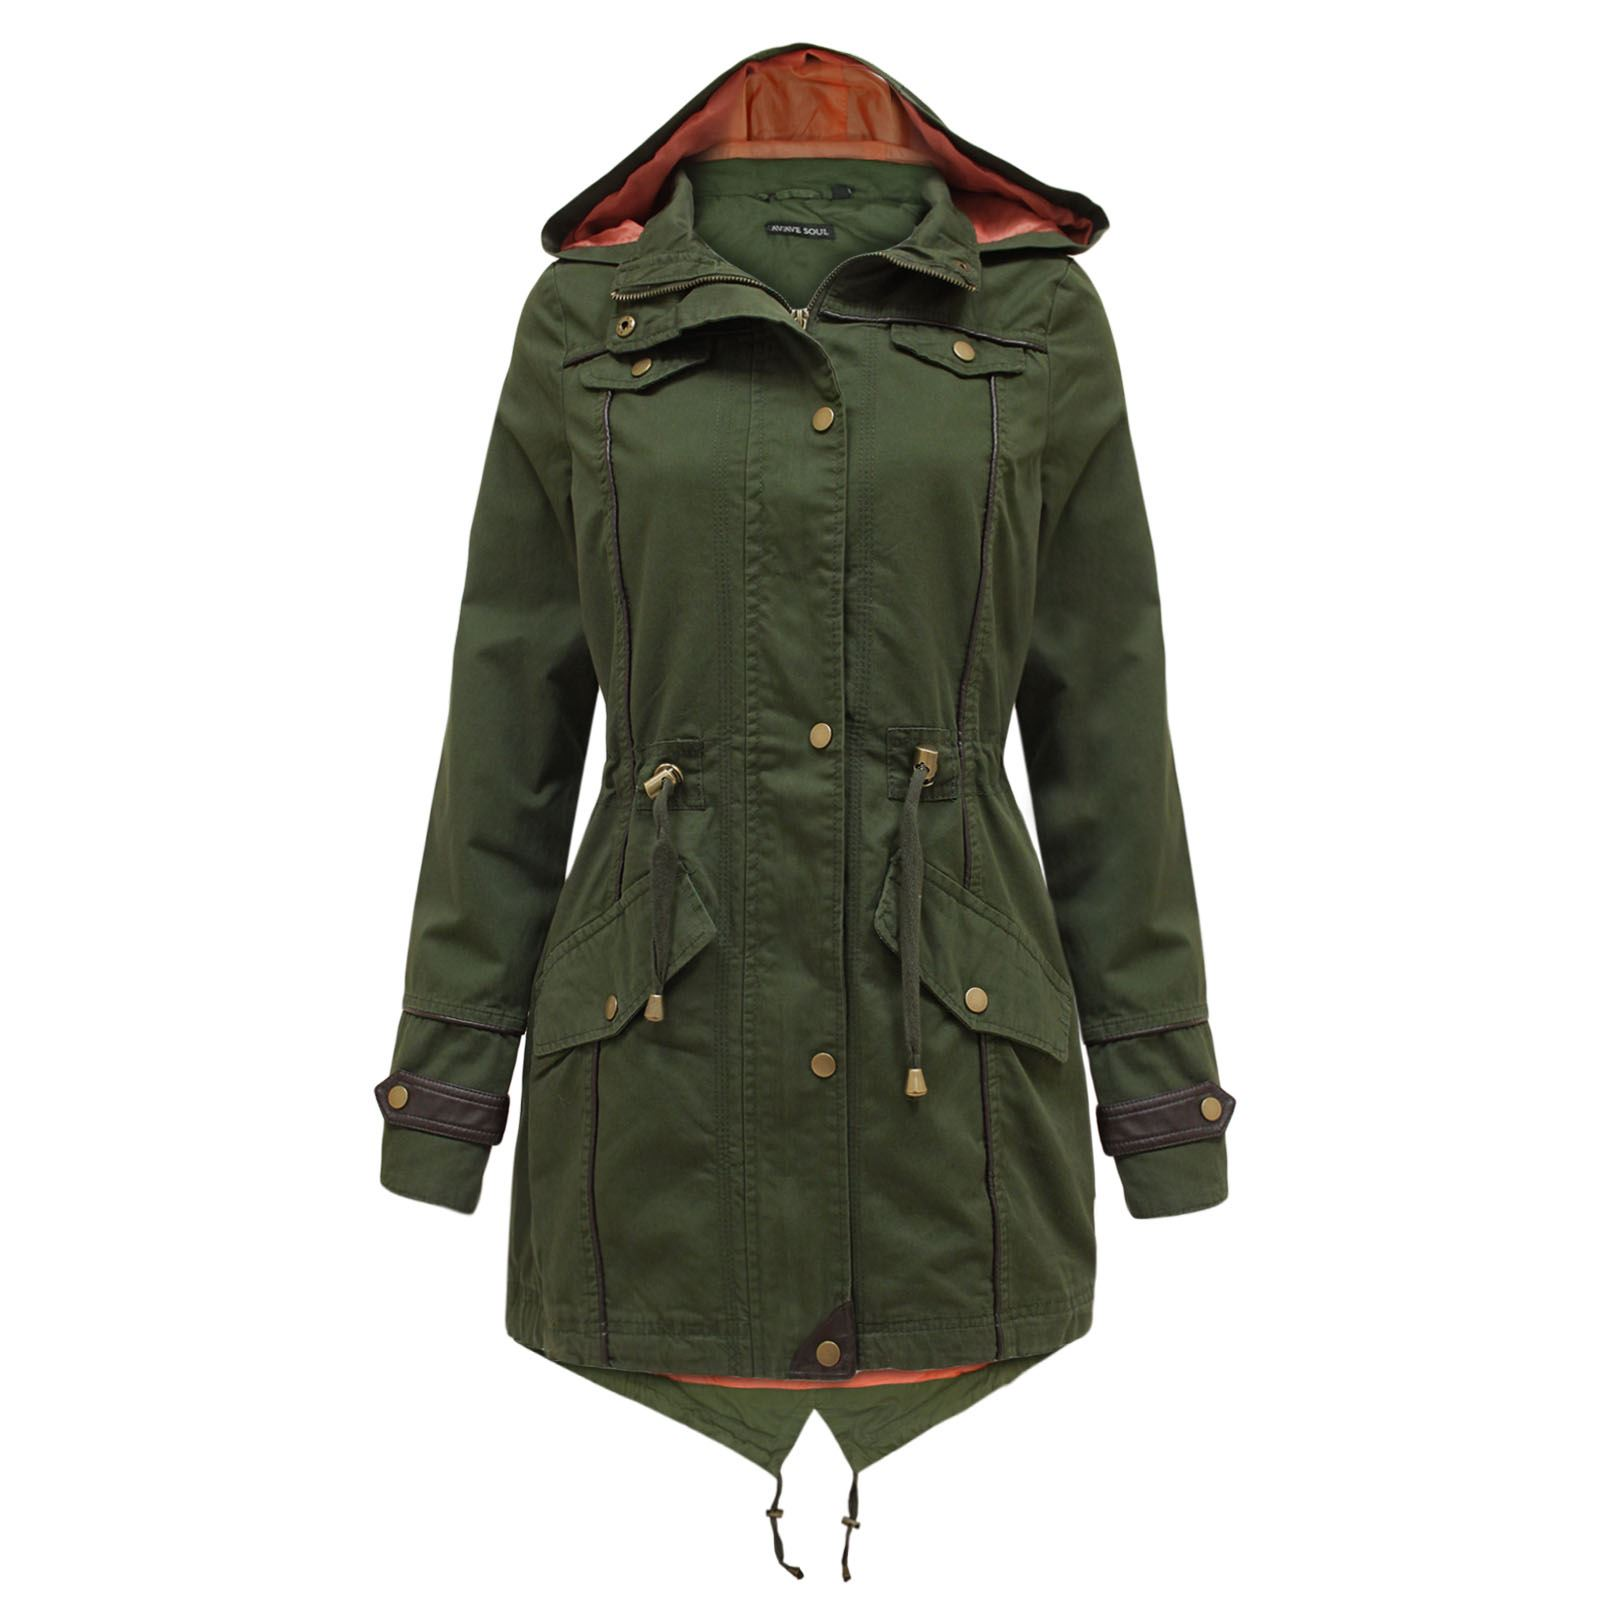 Купить Недорого Осеннюю Куртку Парку